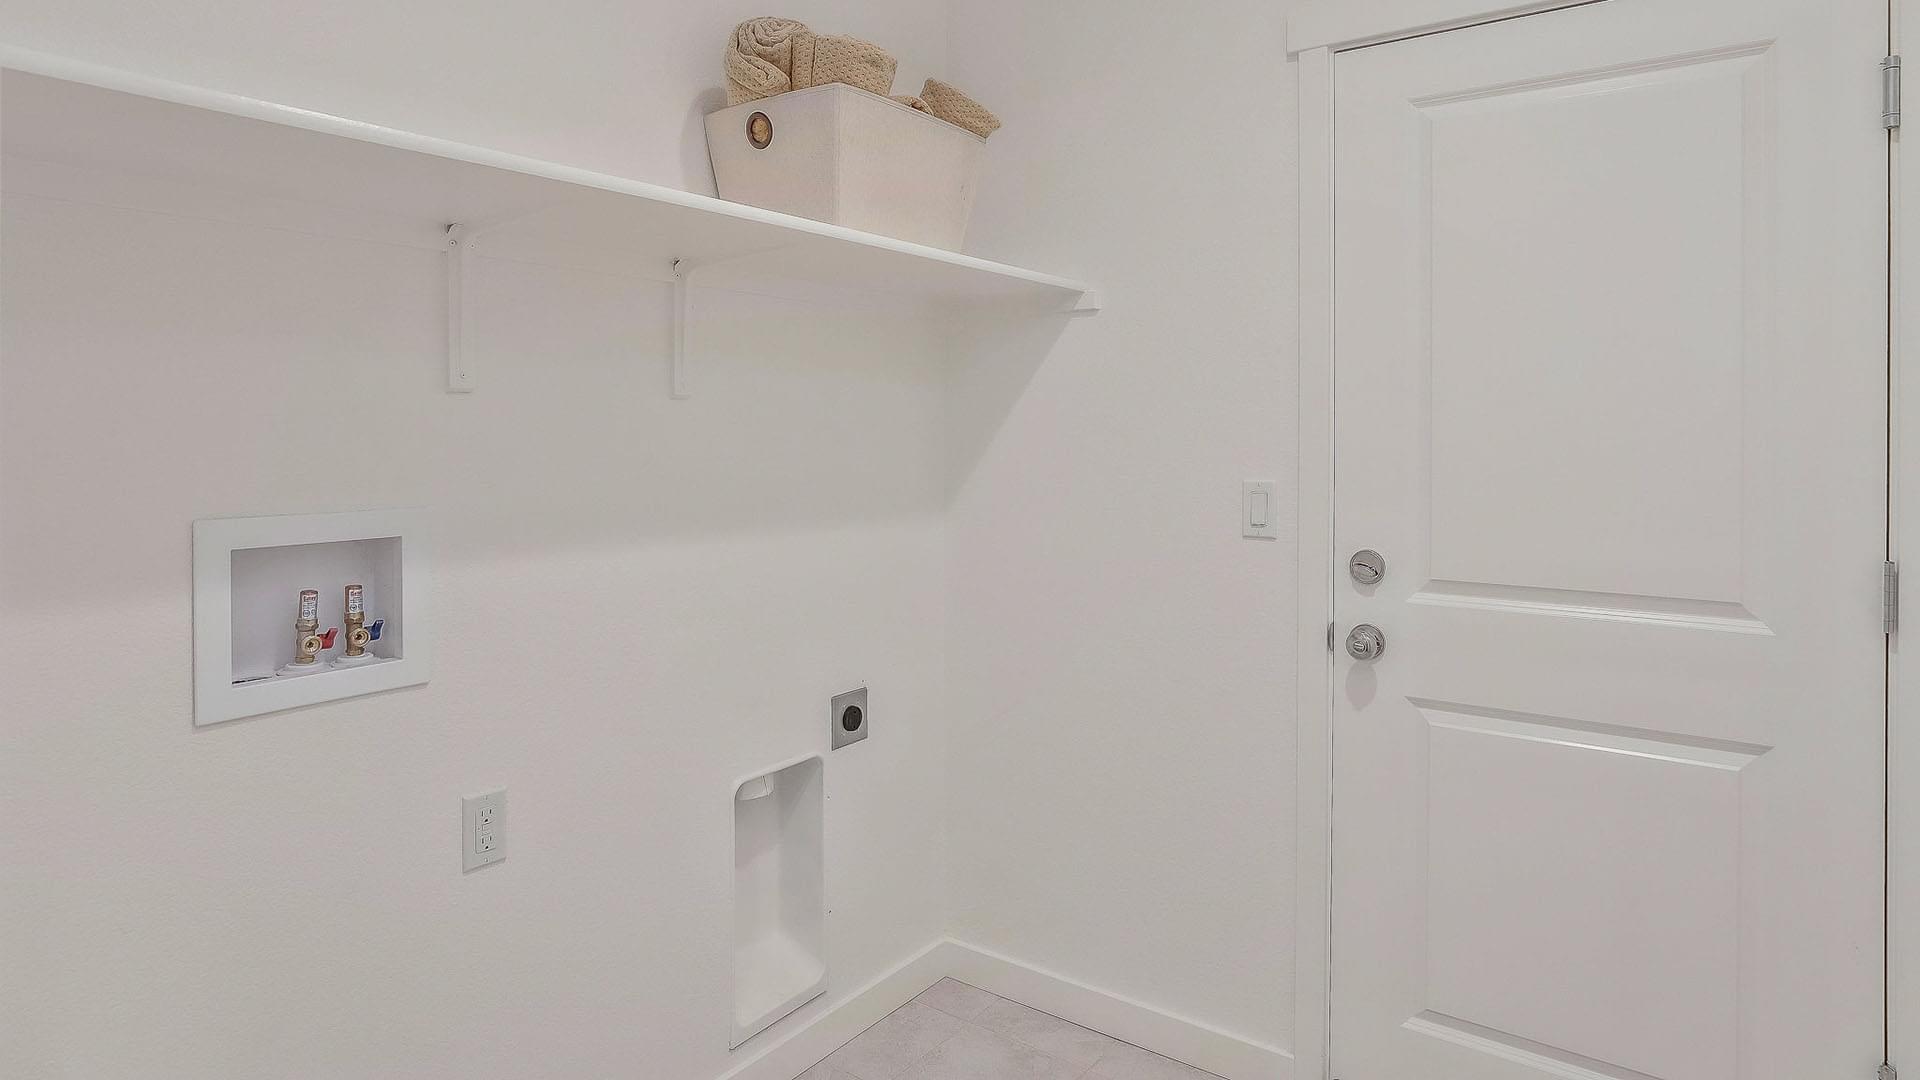 Residence 2 Laundry Room